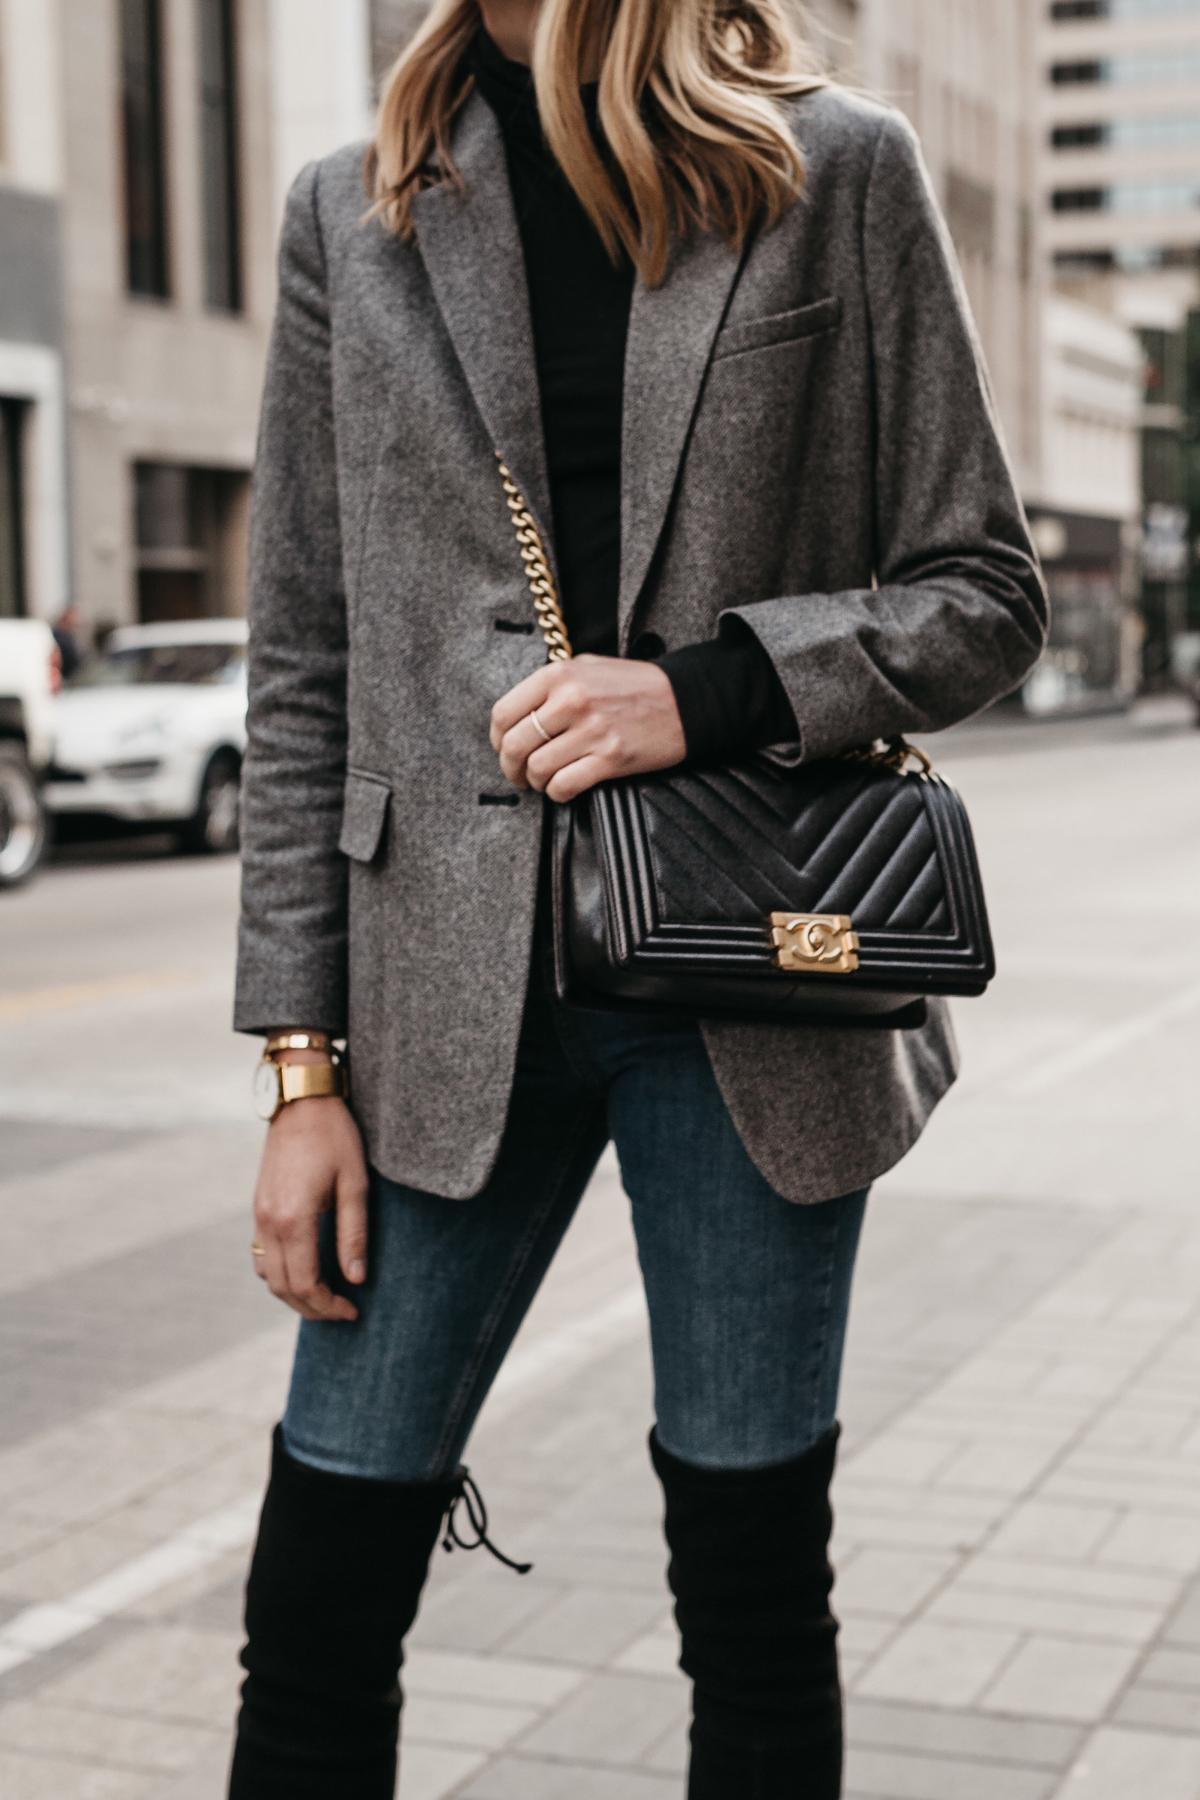 Blonde Woman Wearing Everlane Oversized Grey Blazer Chanel Black Boy Bag Denim Jeans Over the Knee Boots Fashion Jackson Dallas Blogger Fashion Blogger Street Style